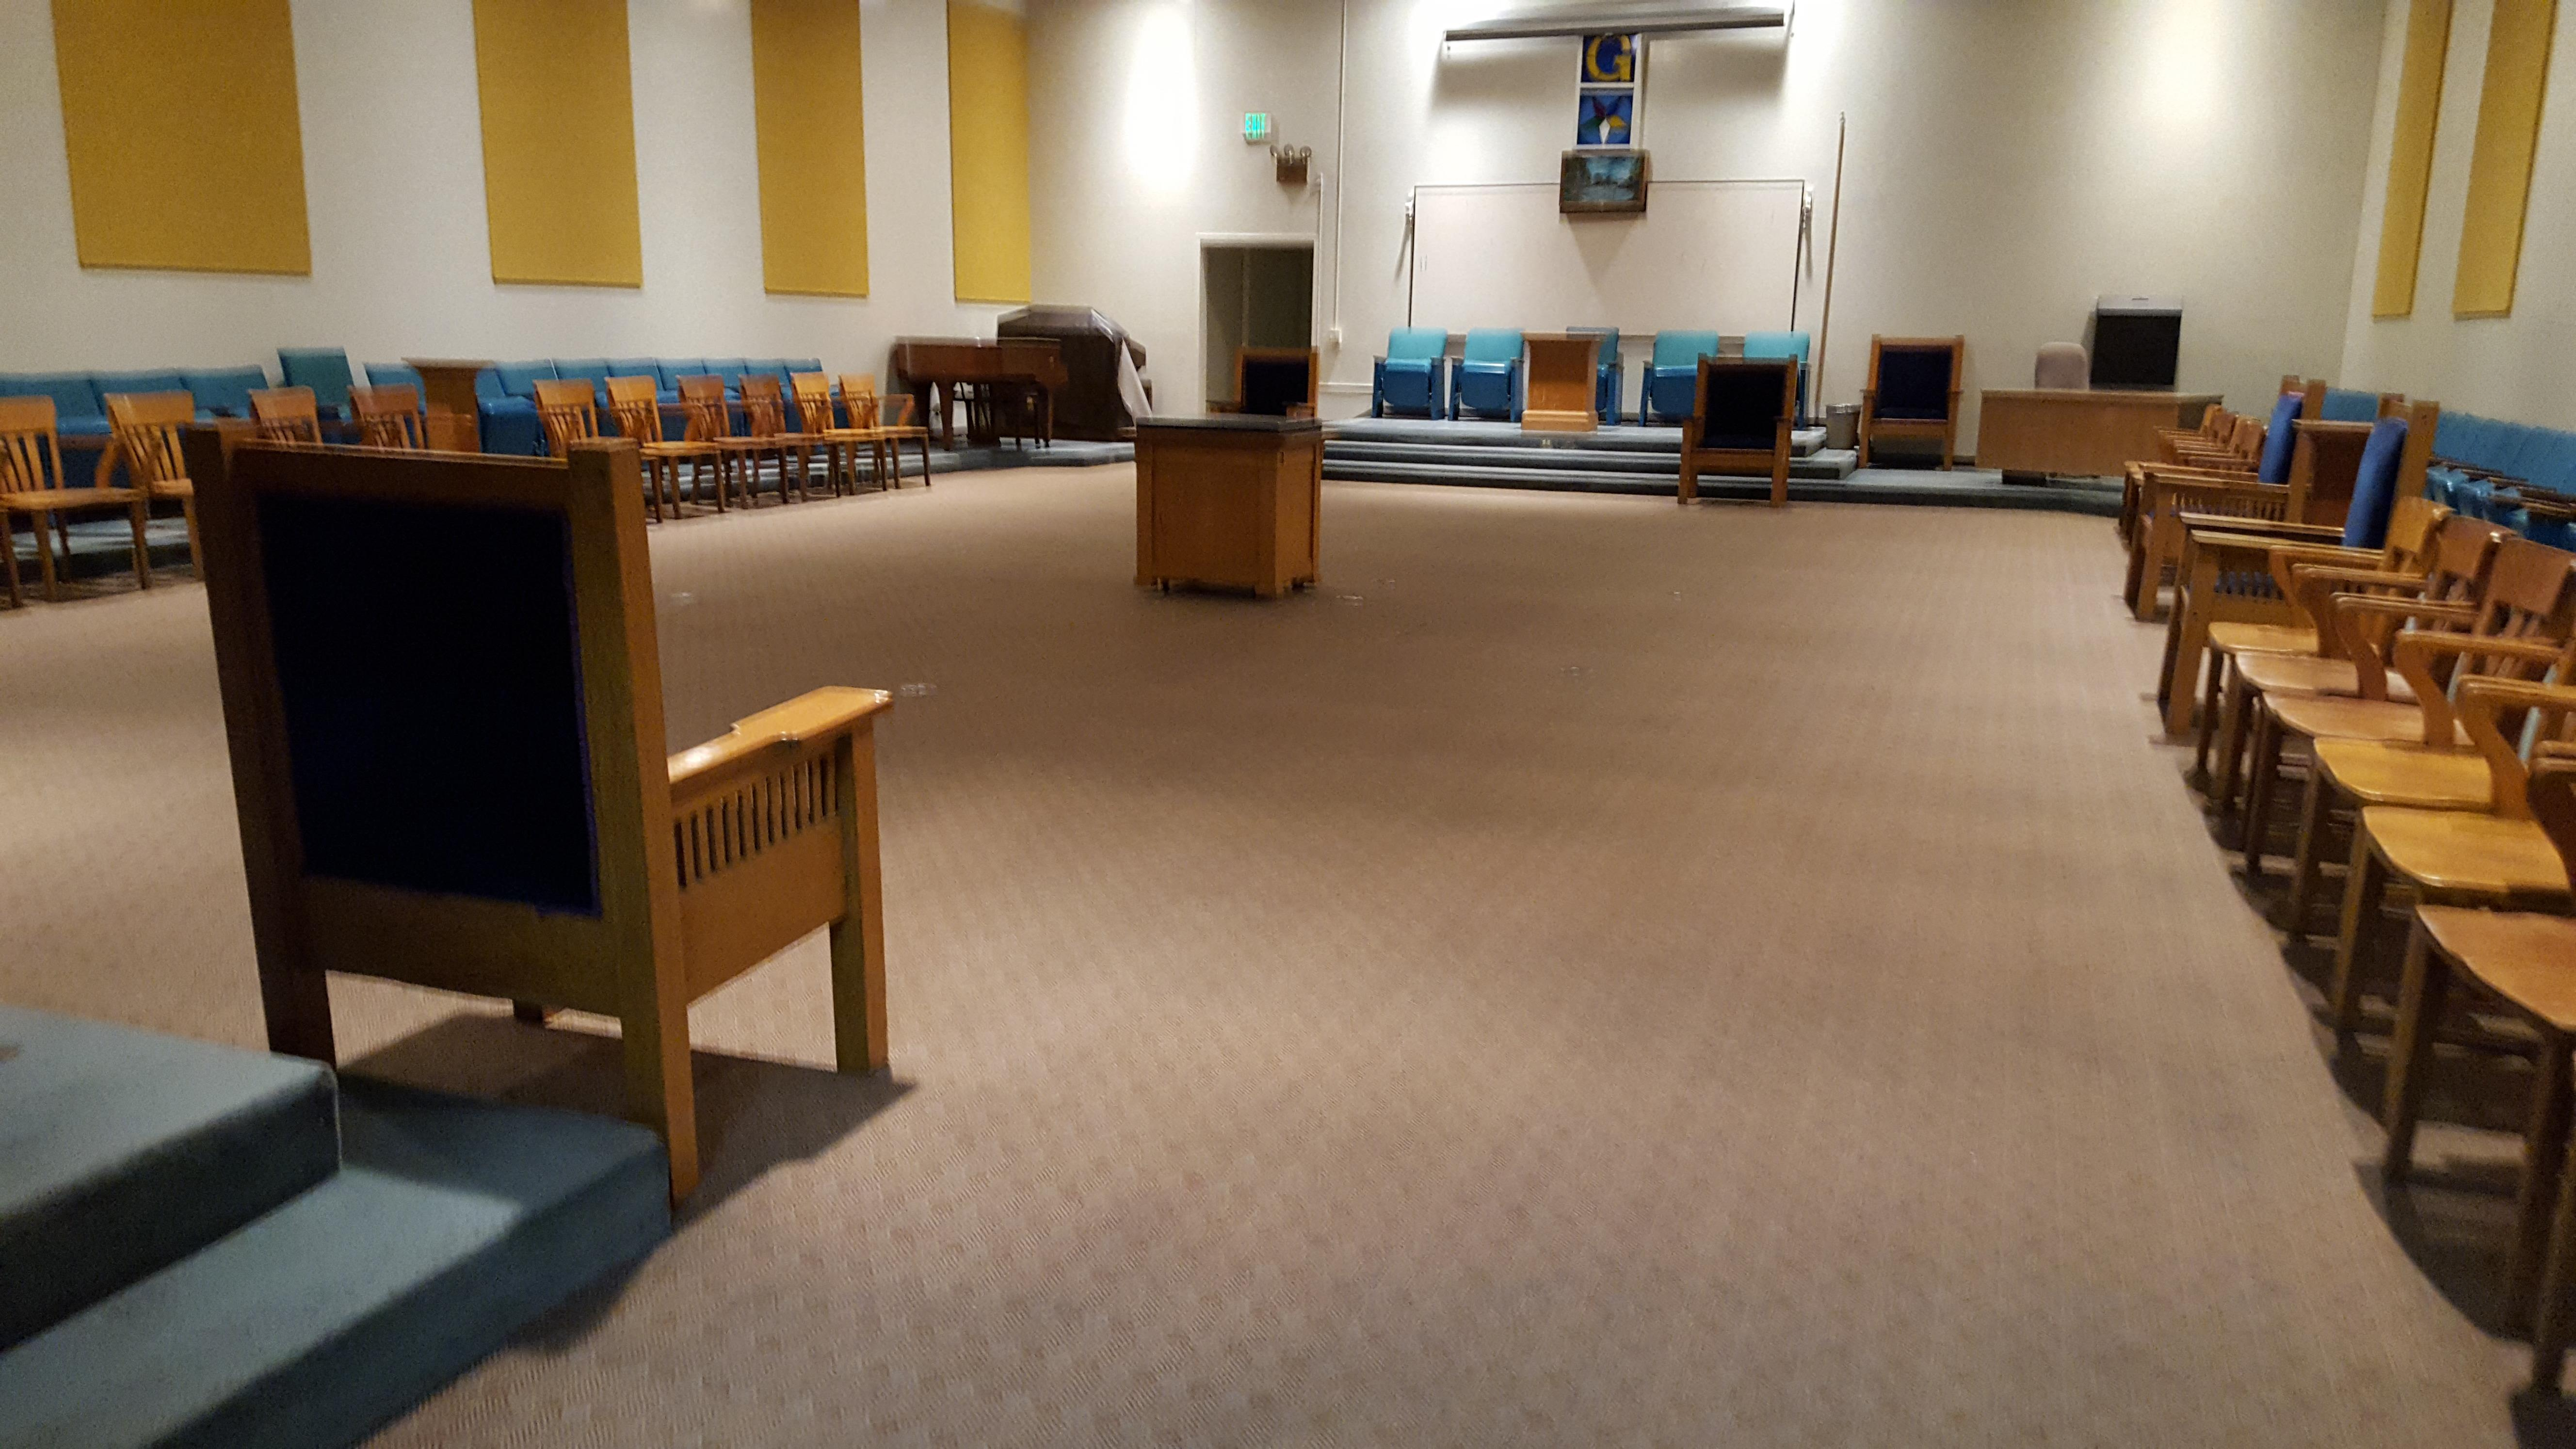 San Jose Masonic Center - Blue Lodge room